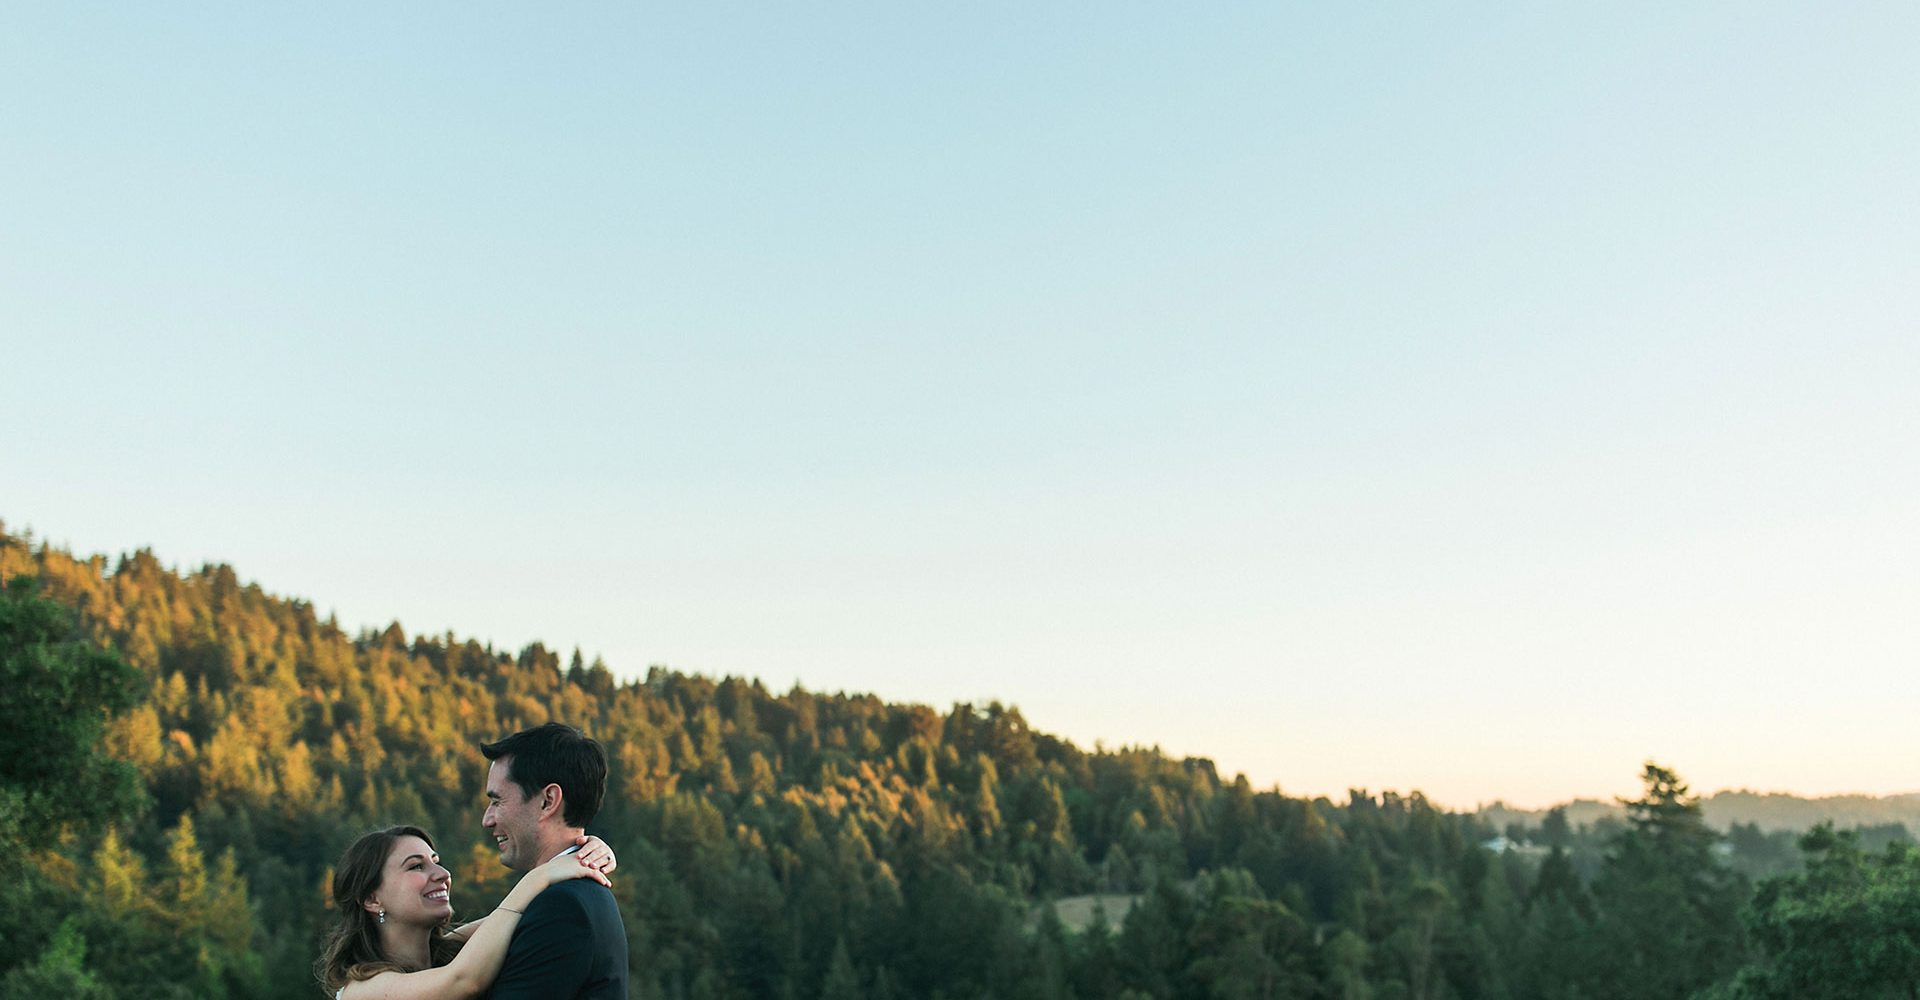 Romantic summer wedding at the Regale Winery in Los Gatos